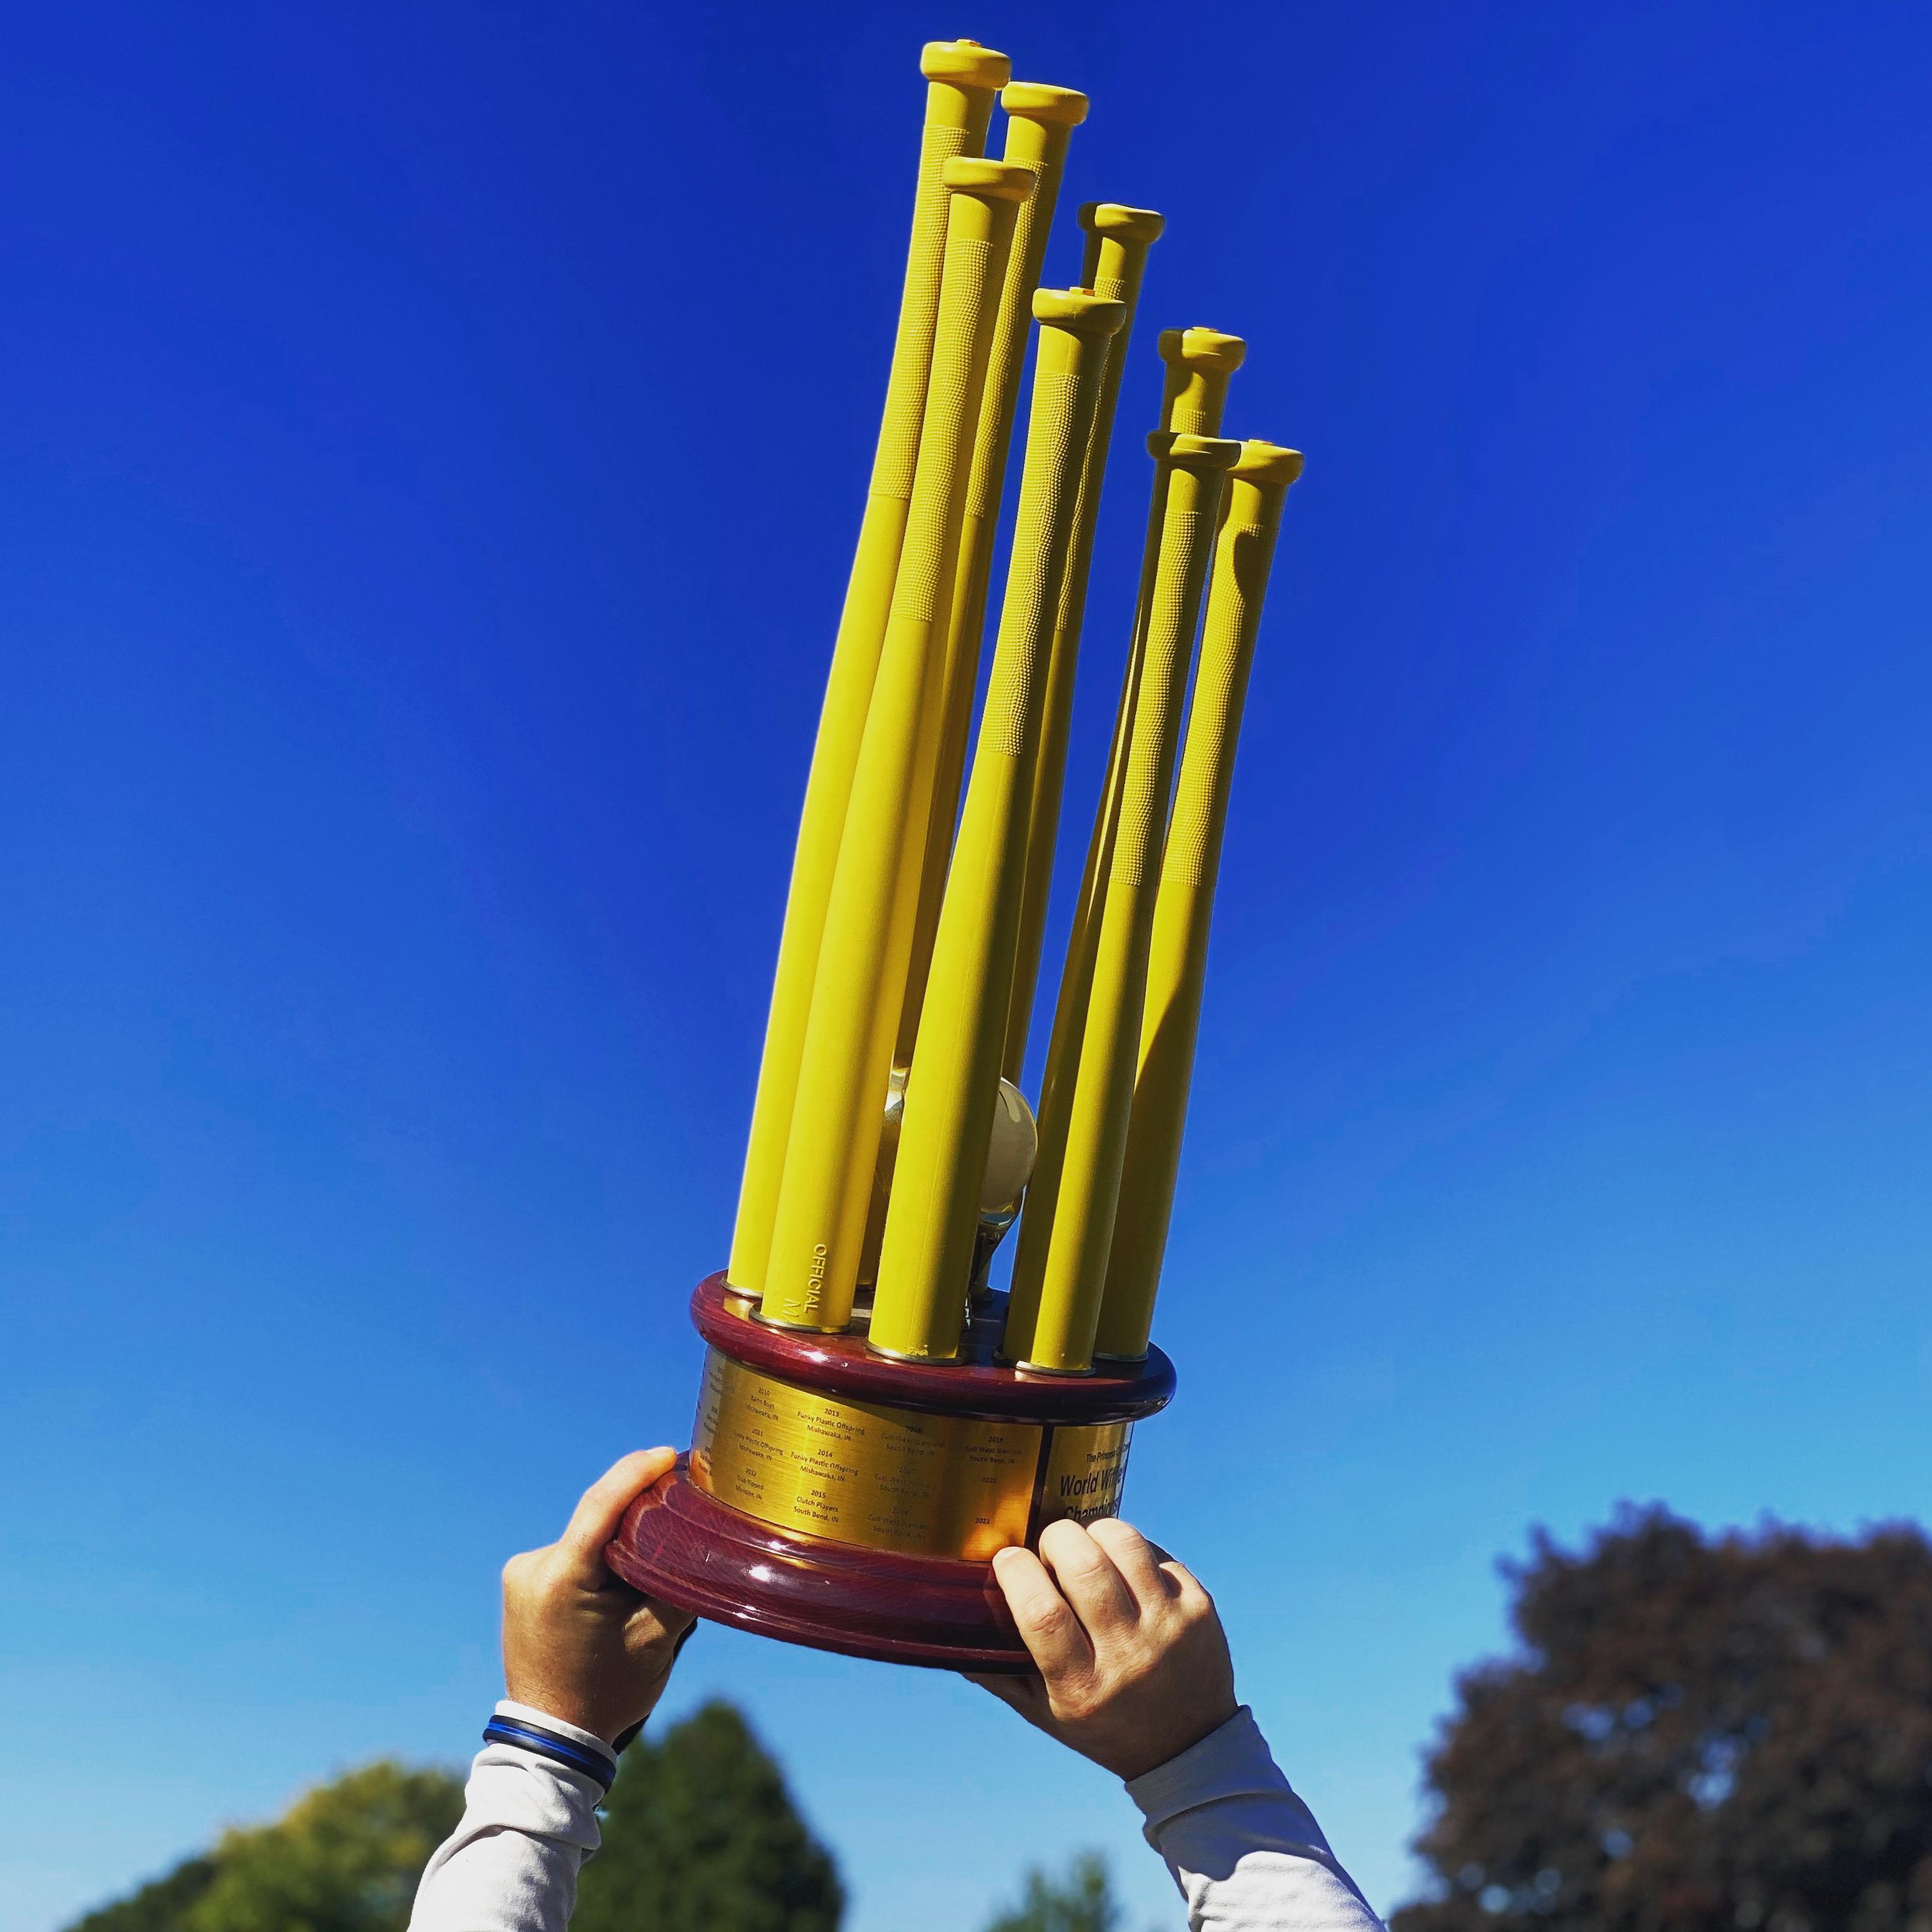 World Wiffle® Ball Championship Highlights